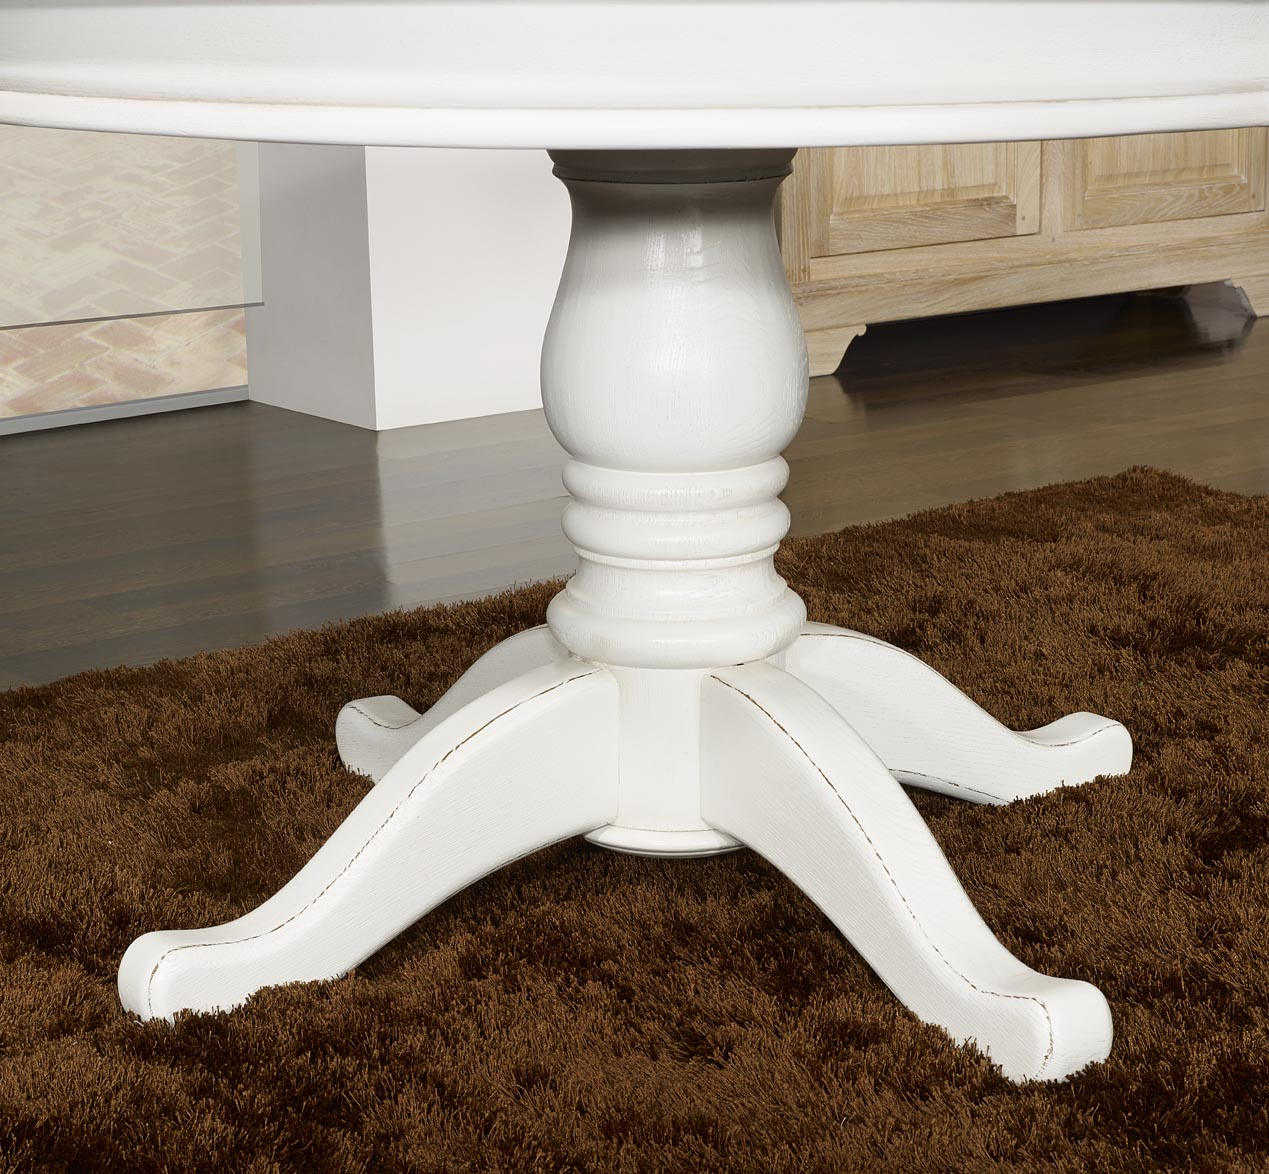 Table ronde pied central en ch ne massif de style louis philippe diametre 120 - Table ronde blanche pied central ...